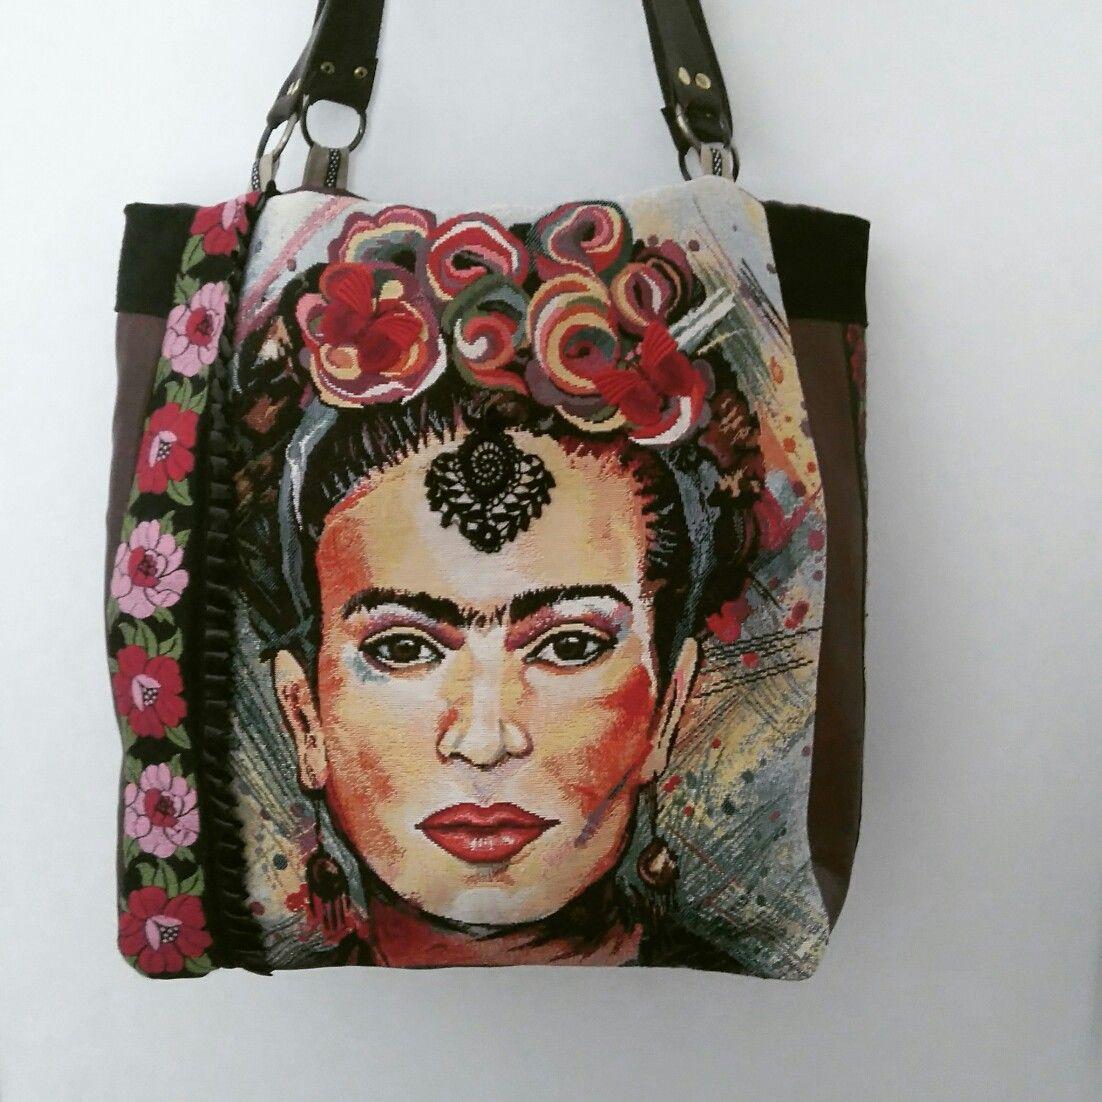 Frida kahlo handbag  Hand sewn in my studio  Others designs soon